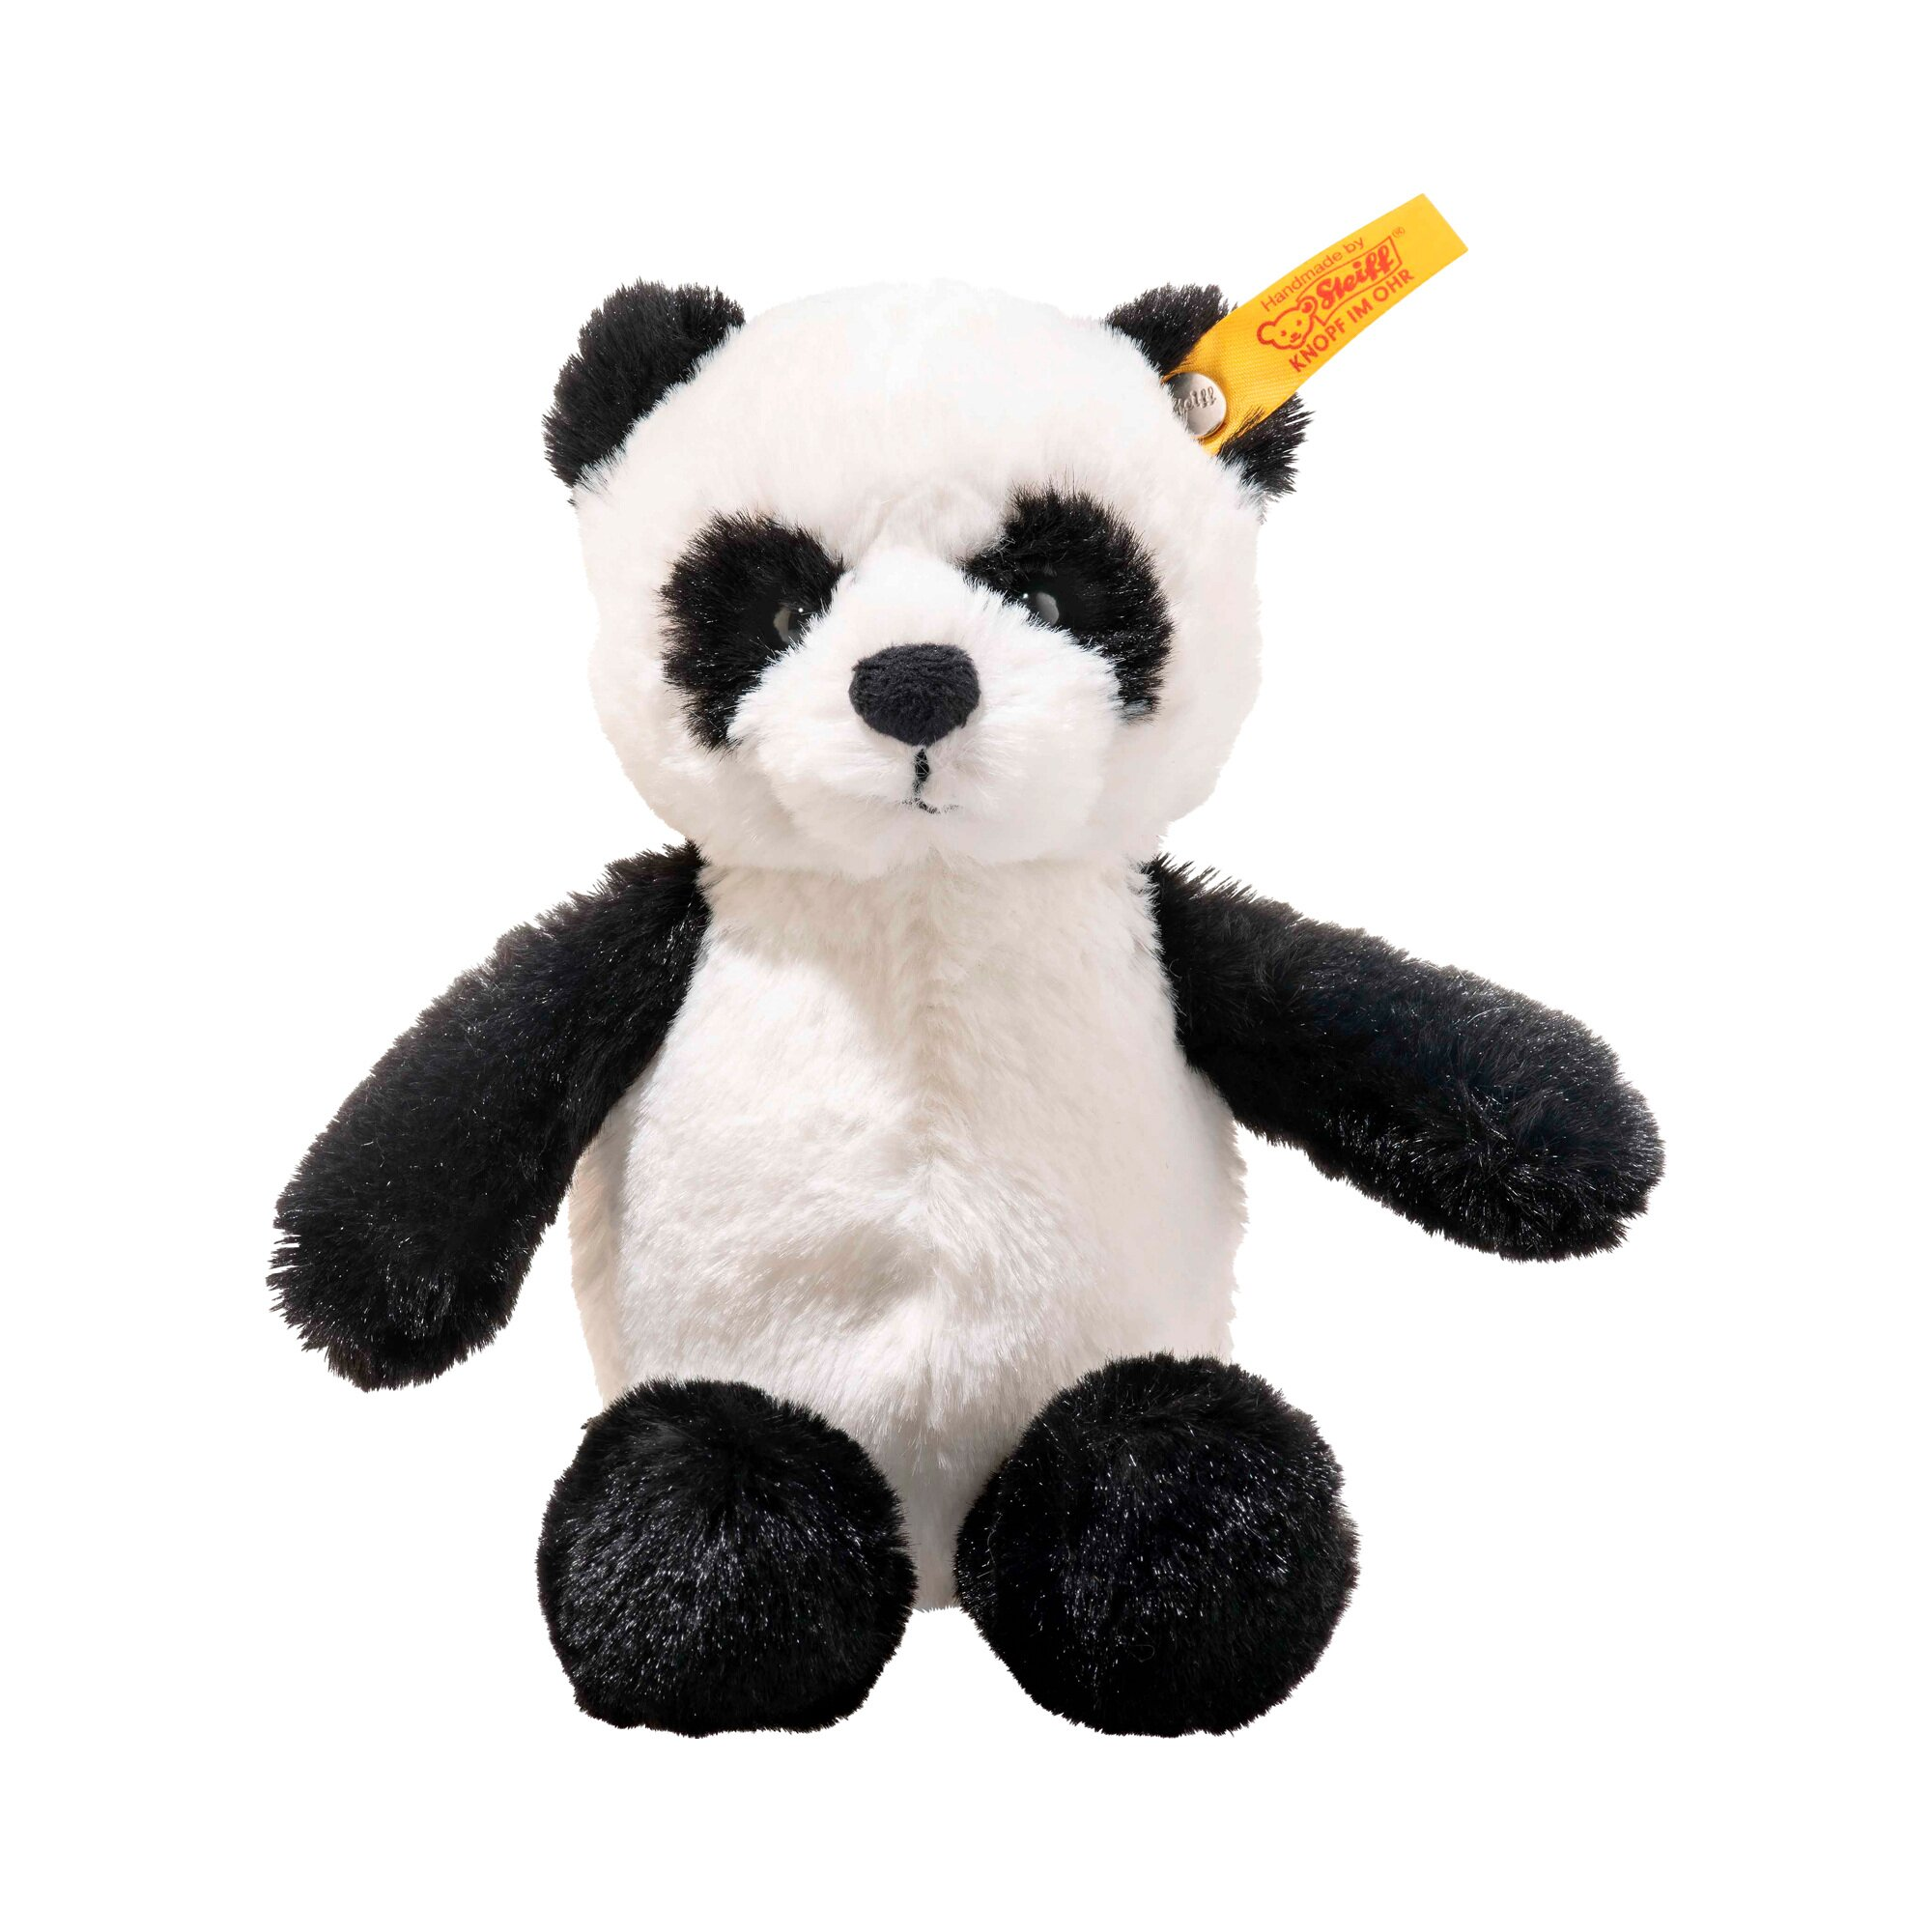 Steiff Kuscheltier Ming Panda Soft Cuddly Friends 16cm